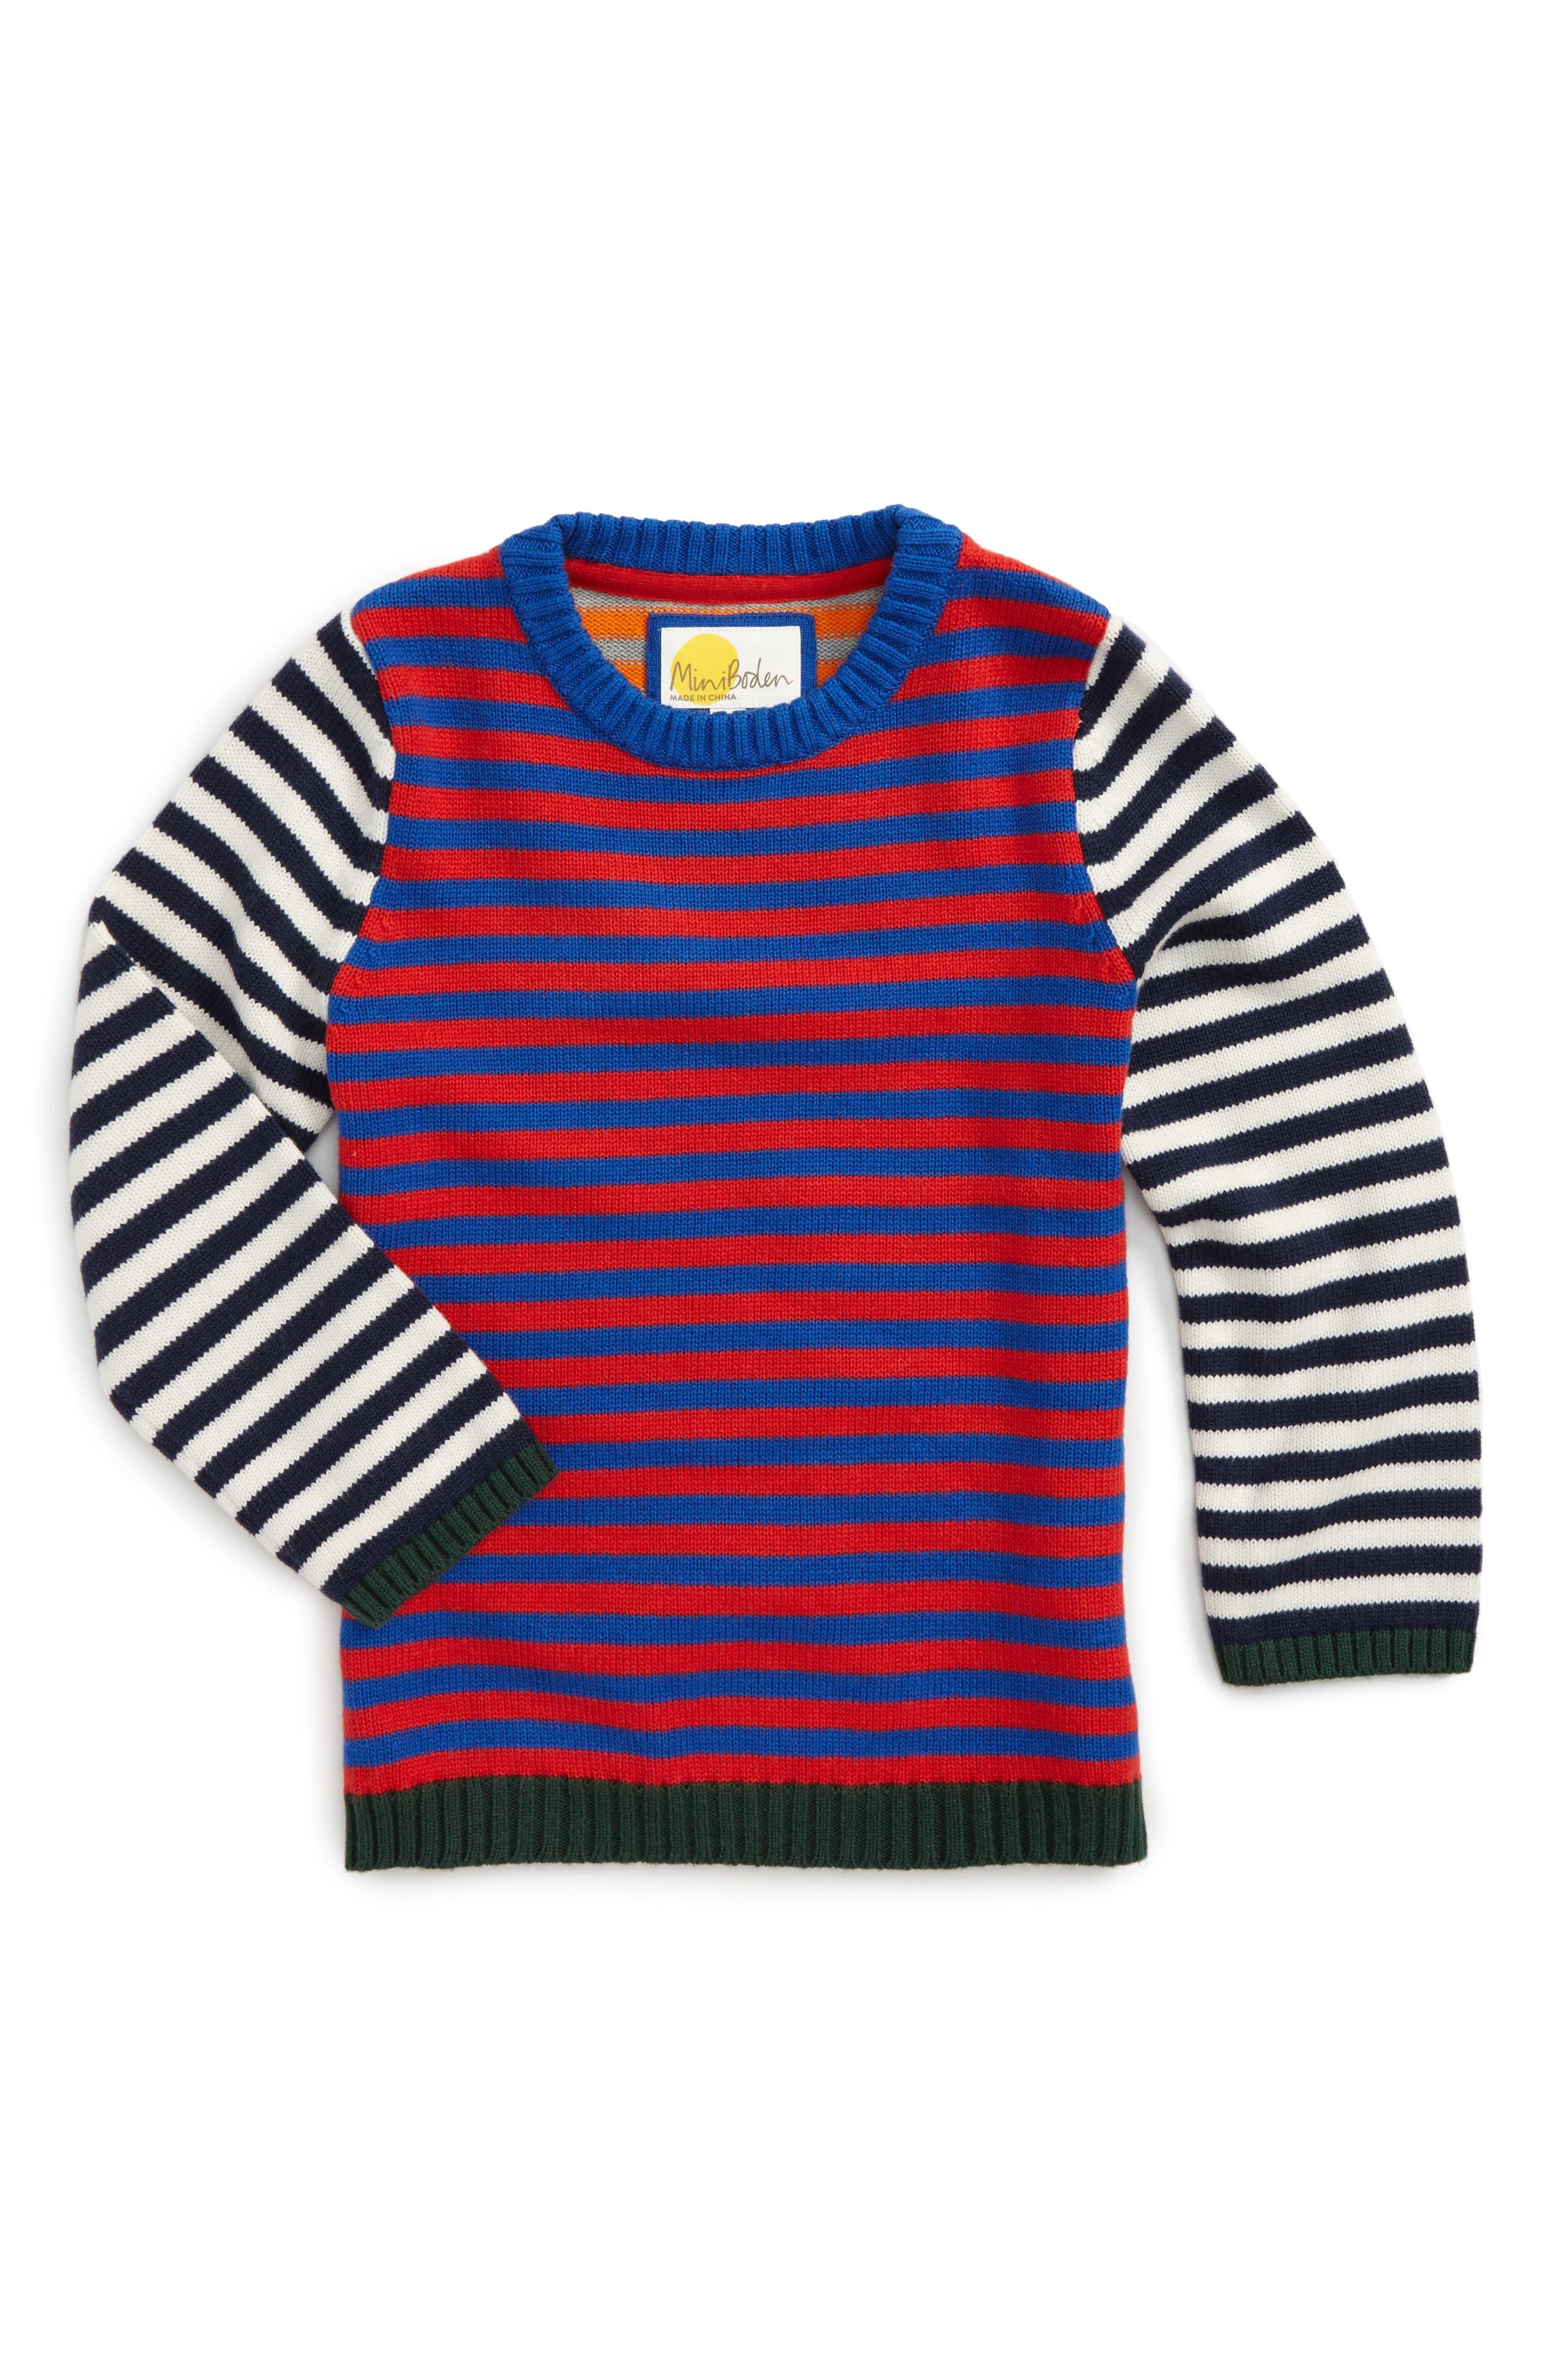 Alternate Image 1 Selected - Mini Boden Hotchpotch Sweater (Toddler Boys, Little Boys & Big Boys)